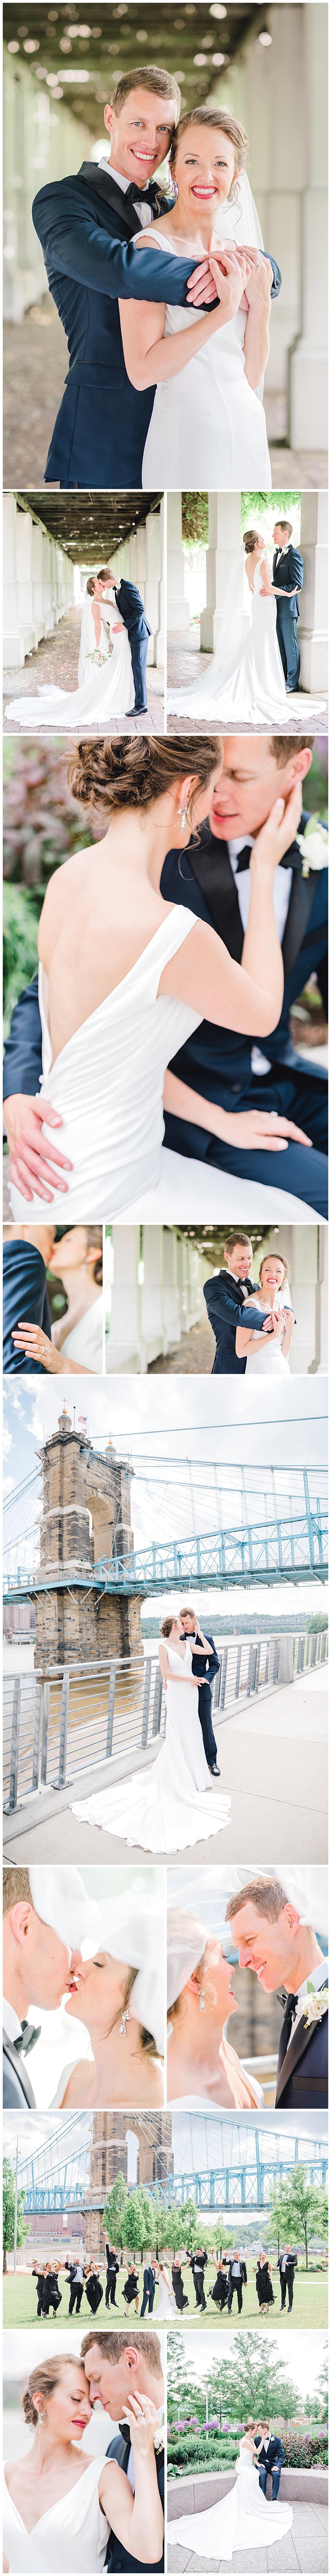 emily and matt's wedding cincinnati ohio chapel lane photography 3